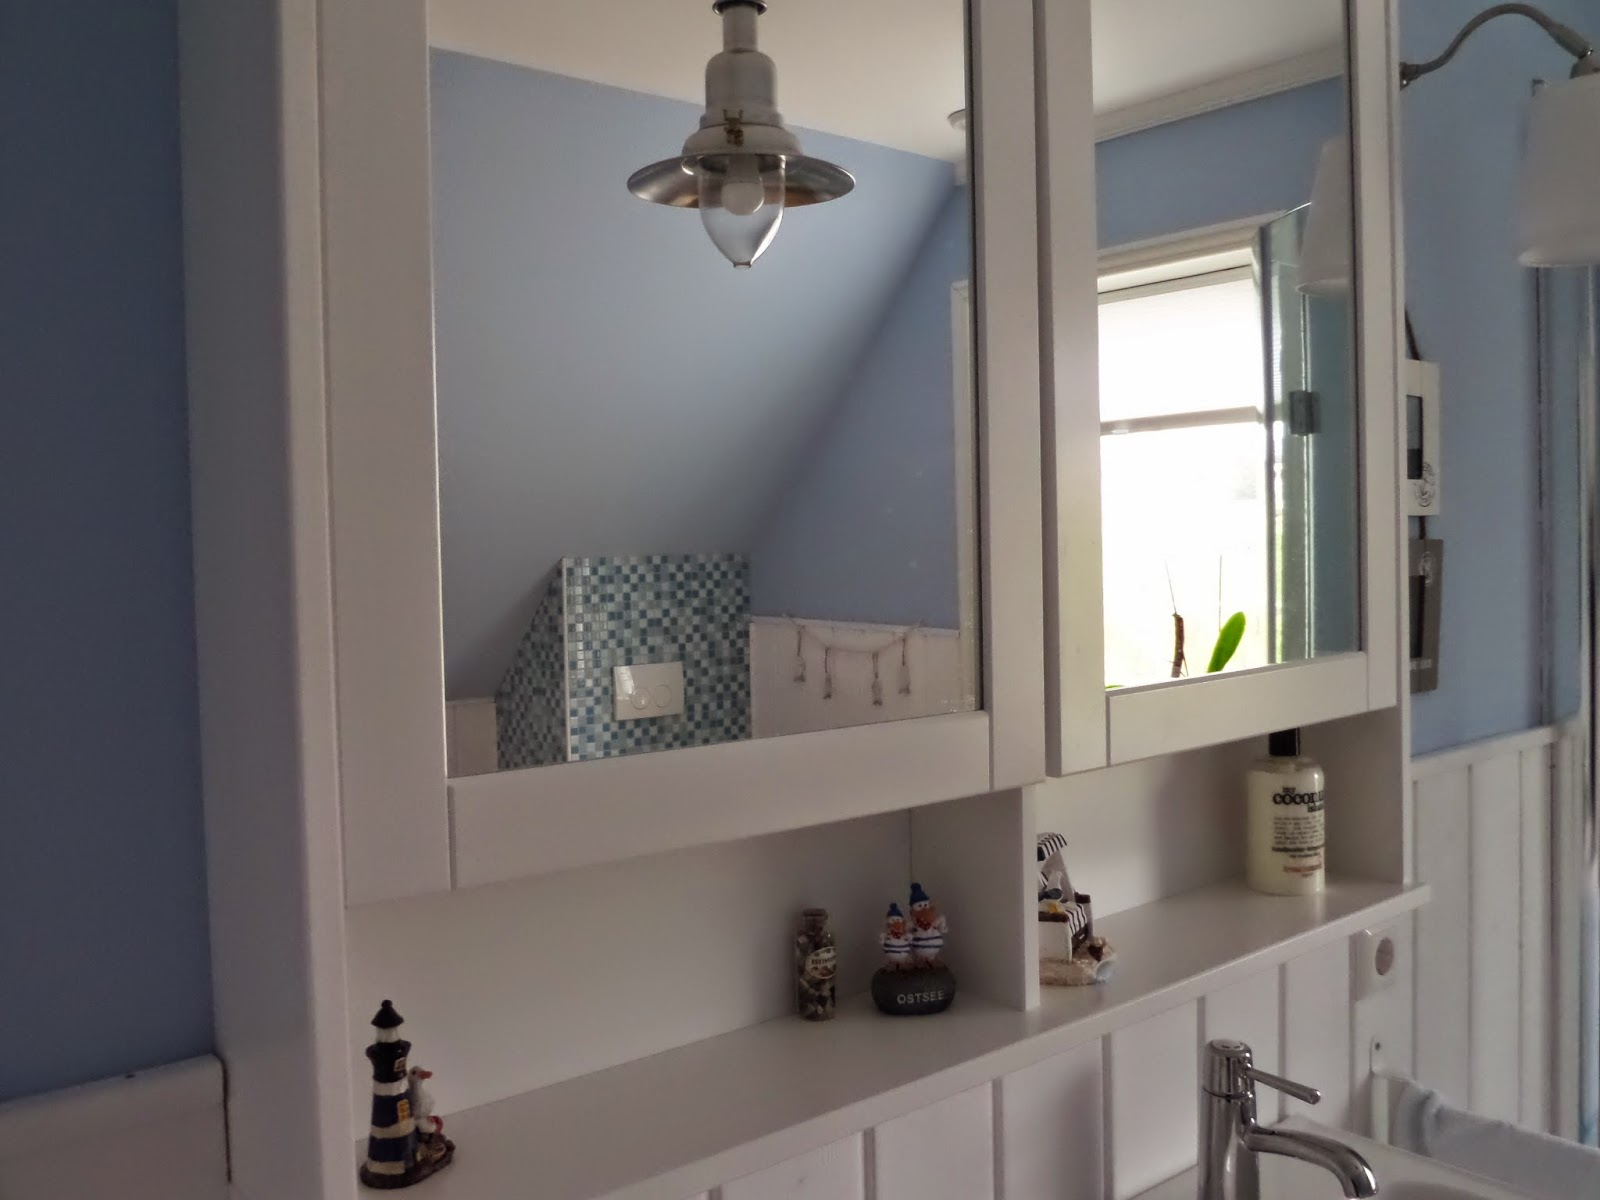 schwedenhaus badezimmer. Black Bedroom Furniture Sets. Home Design Ideas